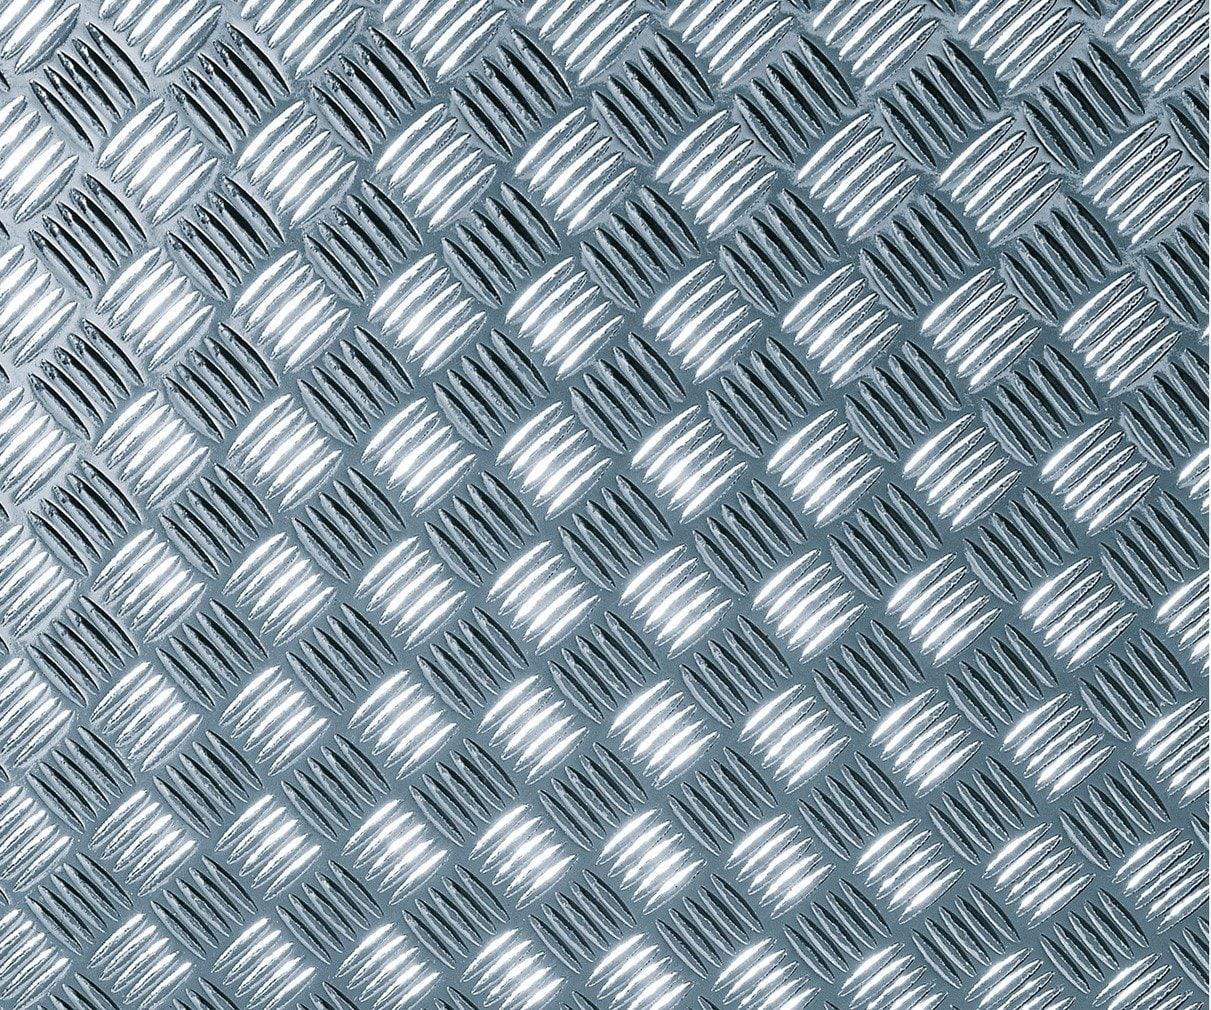 D c fix dekofolien selbstklebend metallic riffelblech for Dekofolien selbstklebend